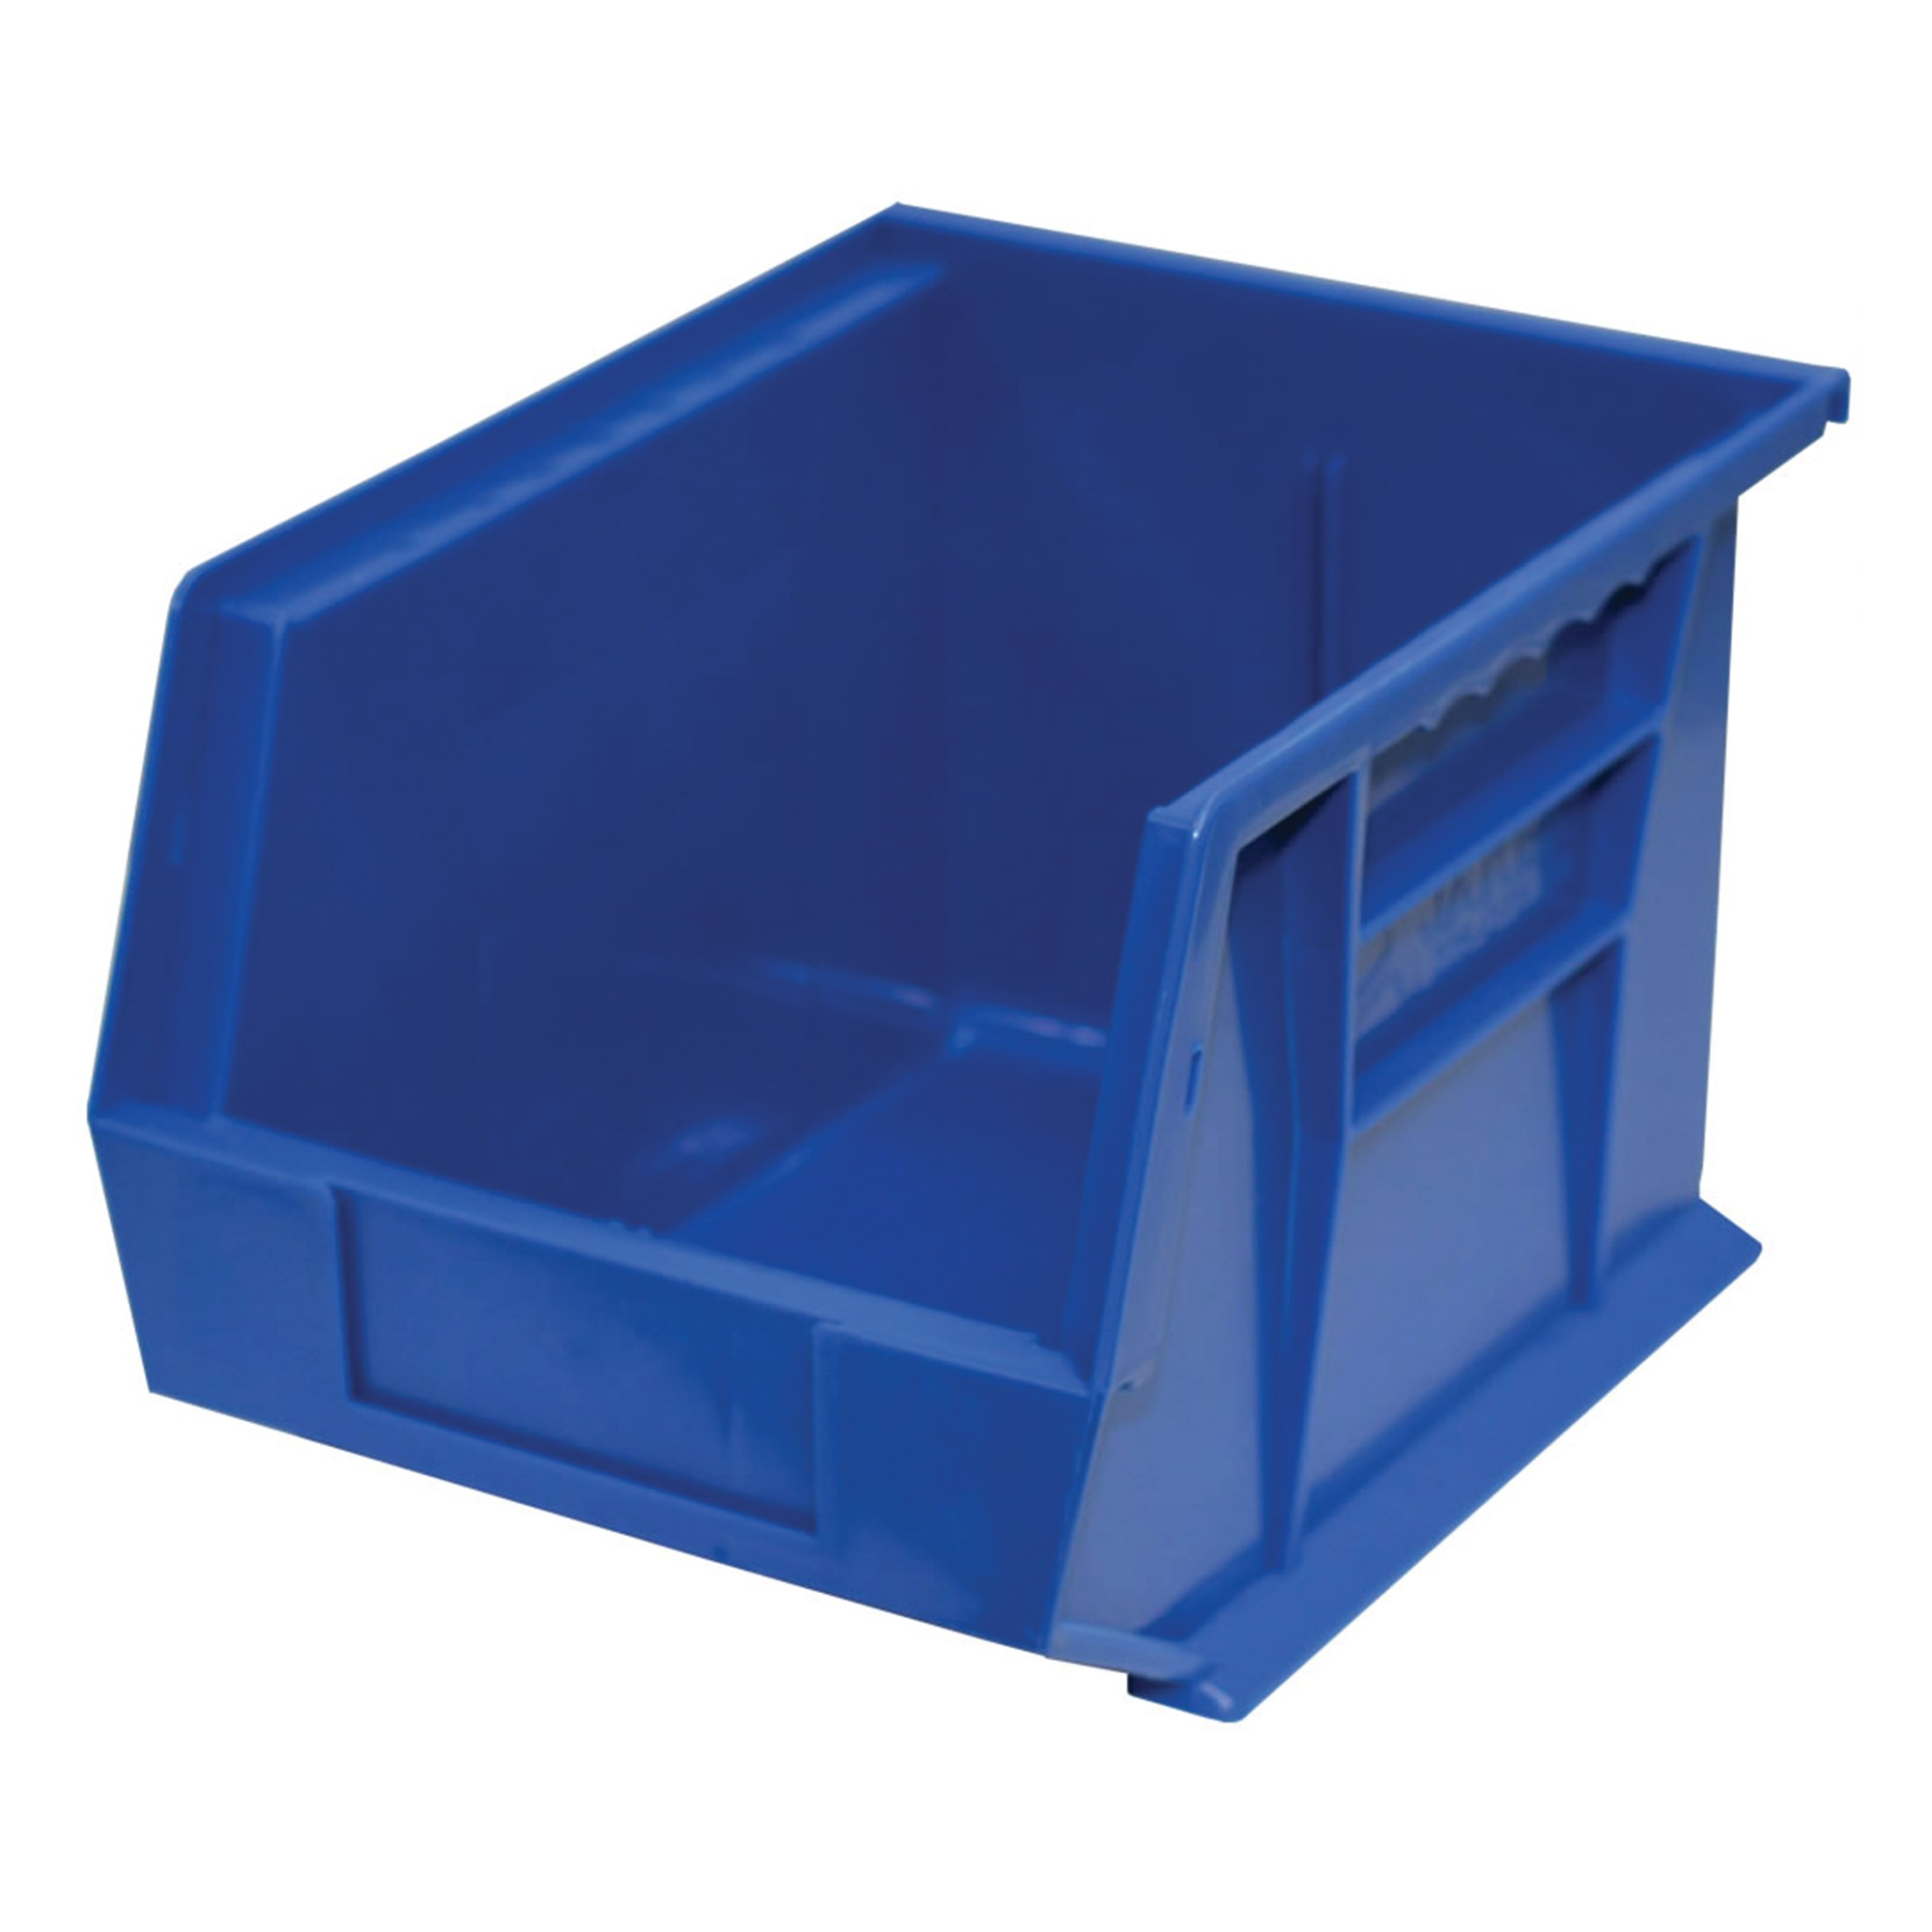 "Storage Max Case of Stackable Blue Bins, 11"" x 8"" x 7"" (6 bins)"